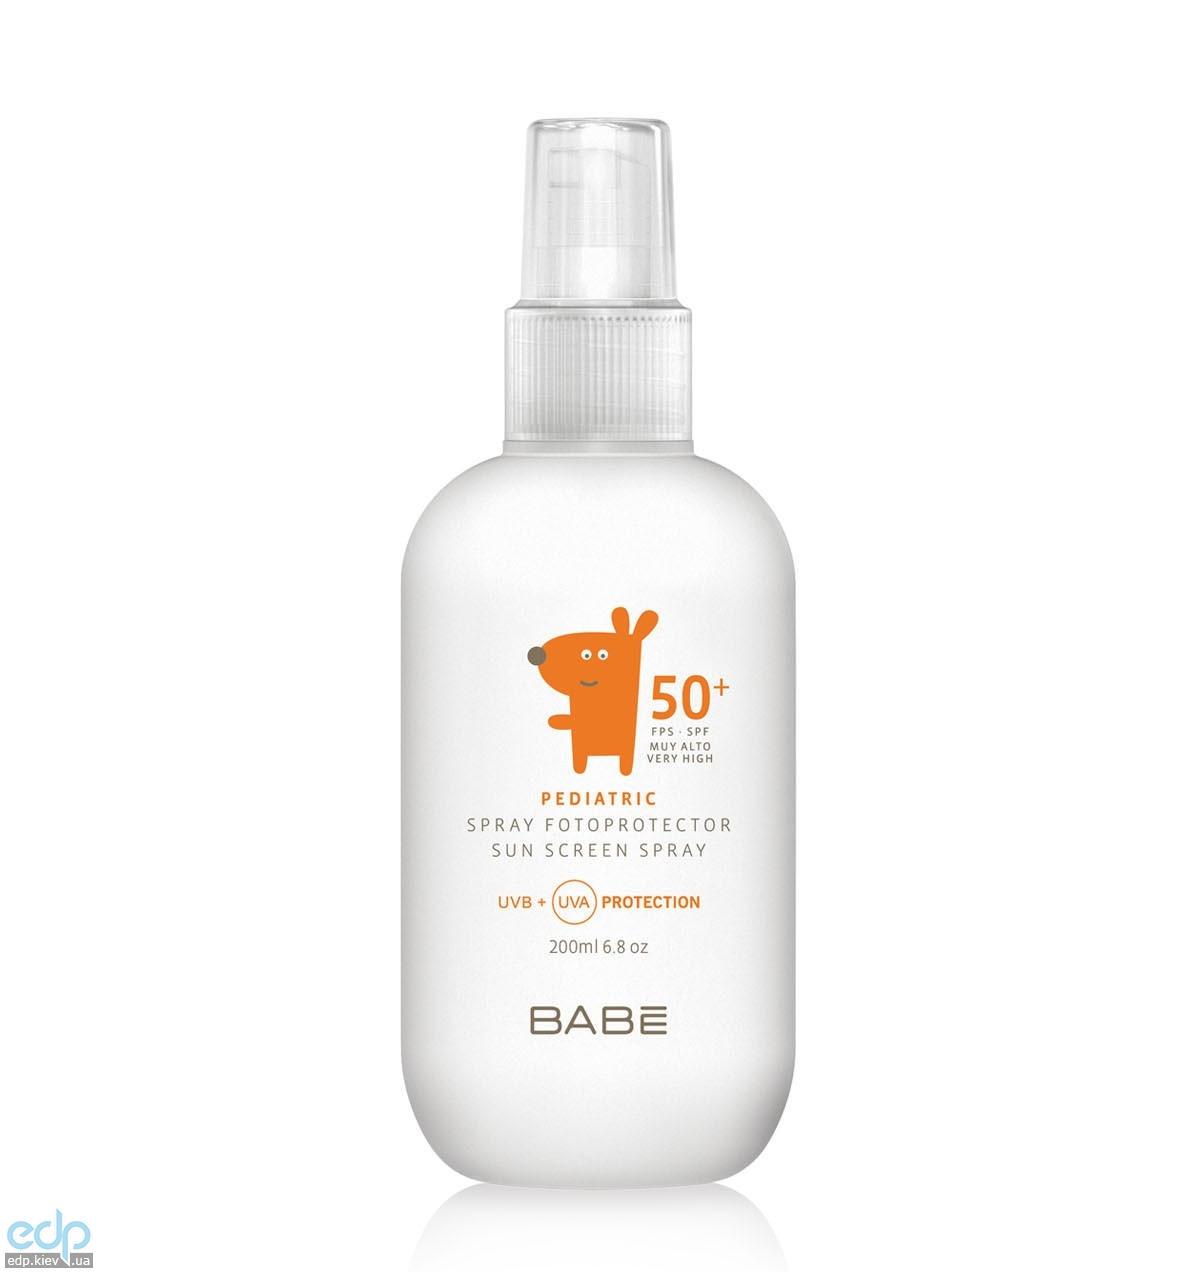 Babe Laboratorios - Солнцезащитный спрей детский SPF 50 - 200 ml (арт. 161890025)